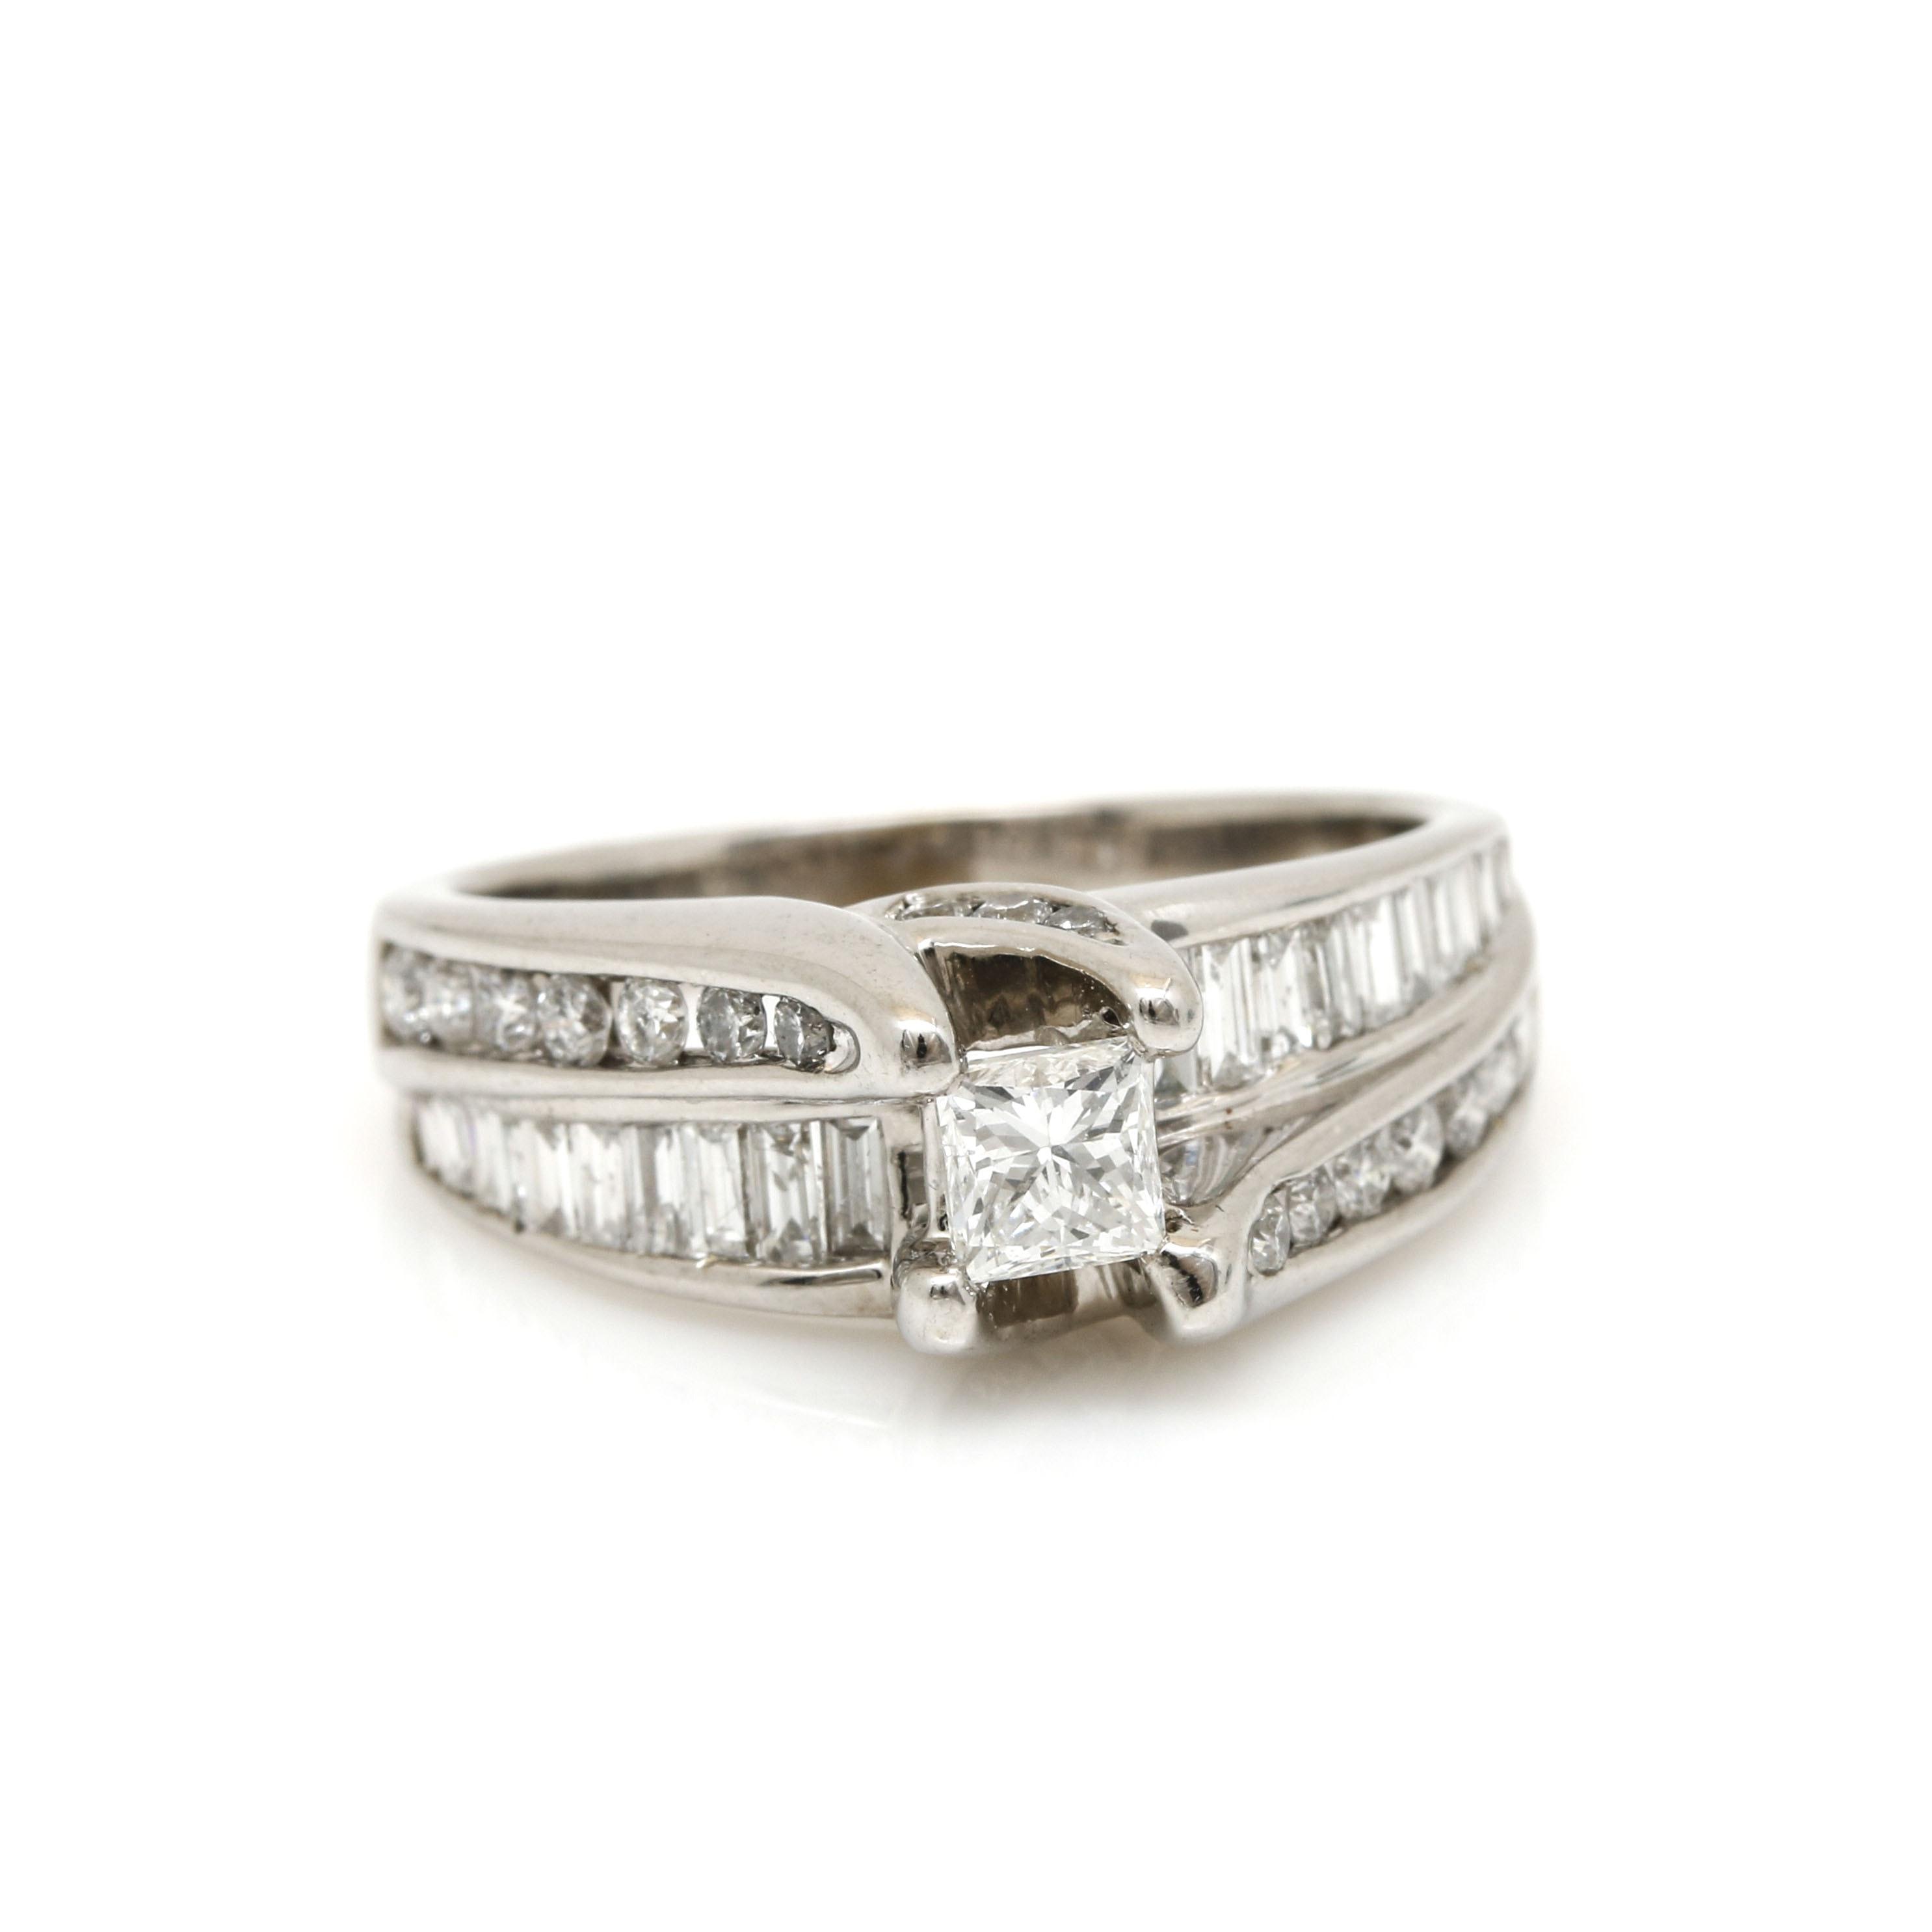 14K White Gold 1.18 CTW Diamond Ring